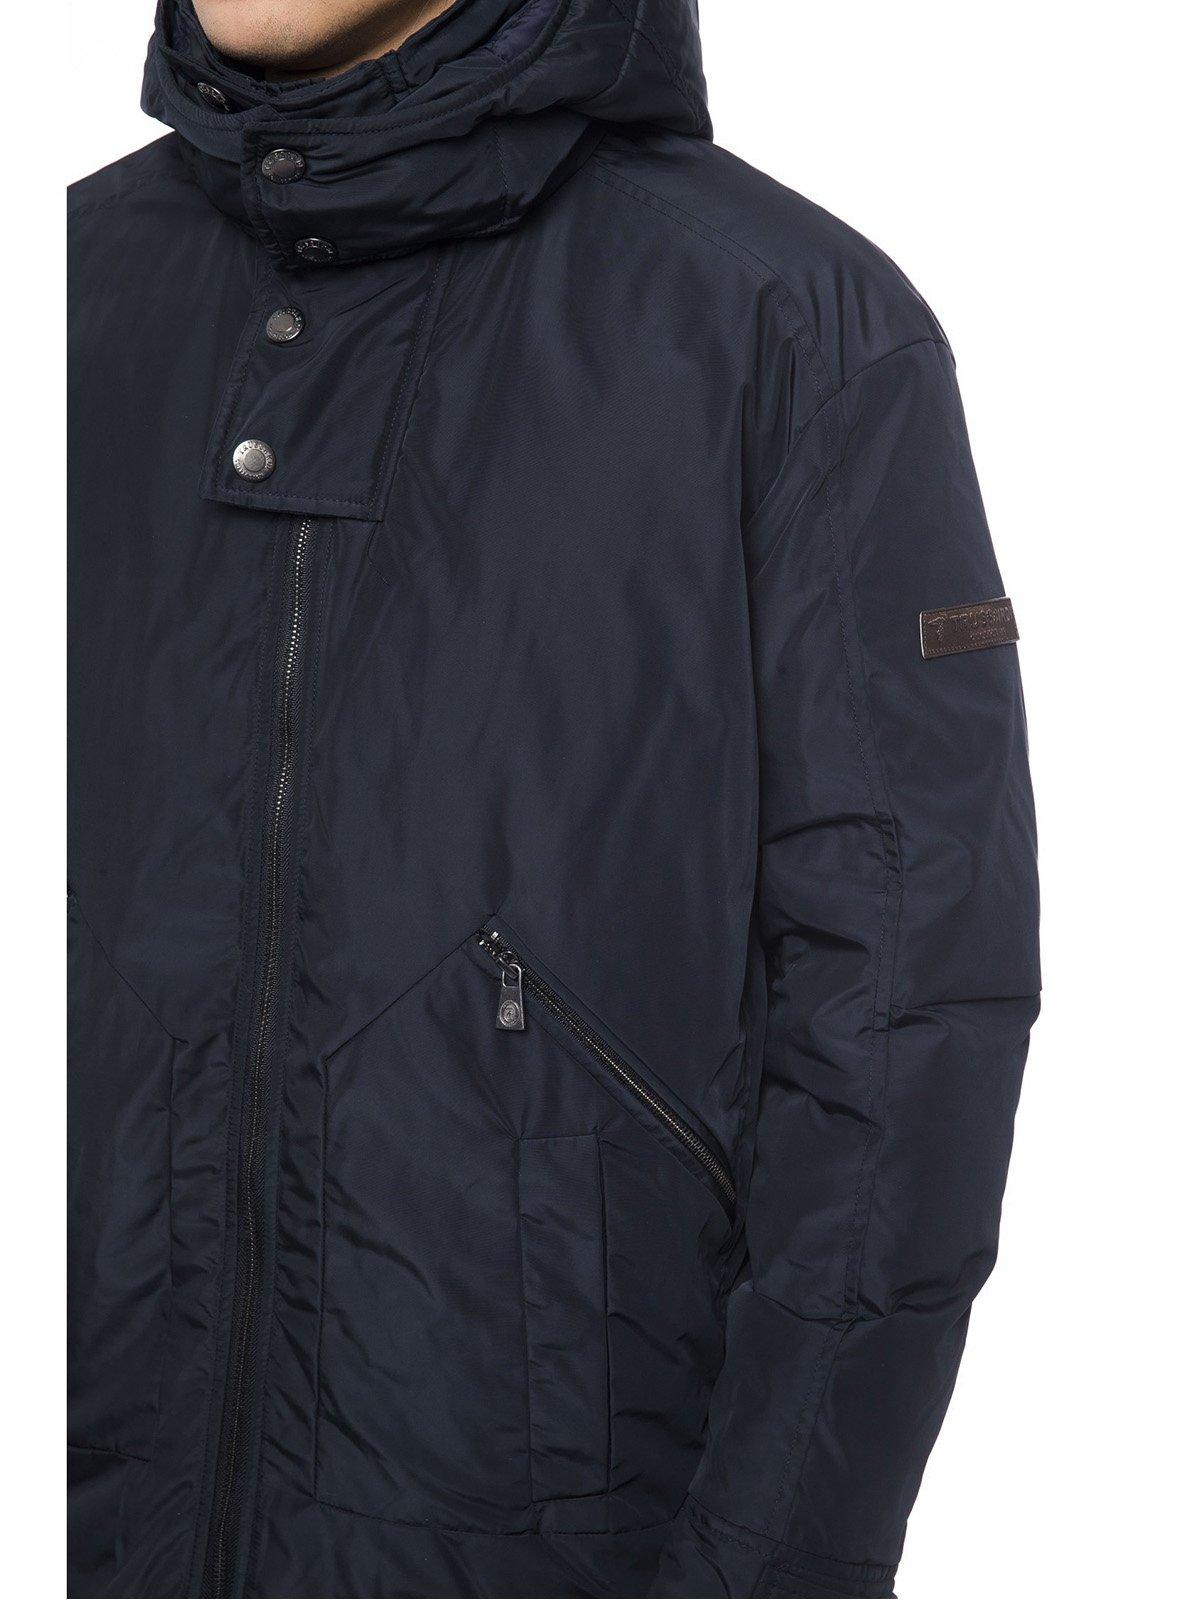 Куртка темно-синя | 3753369 | фото 4